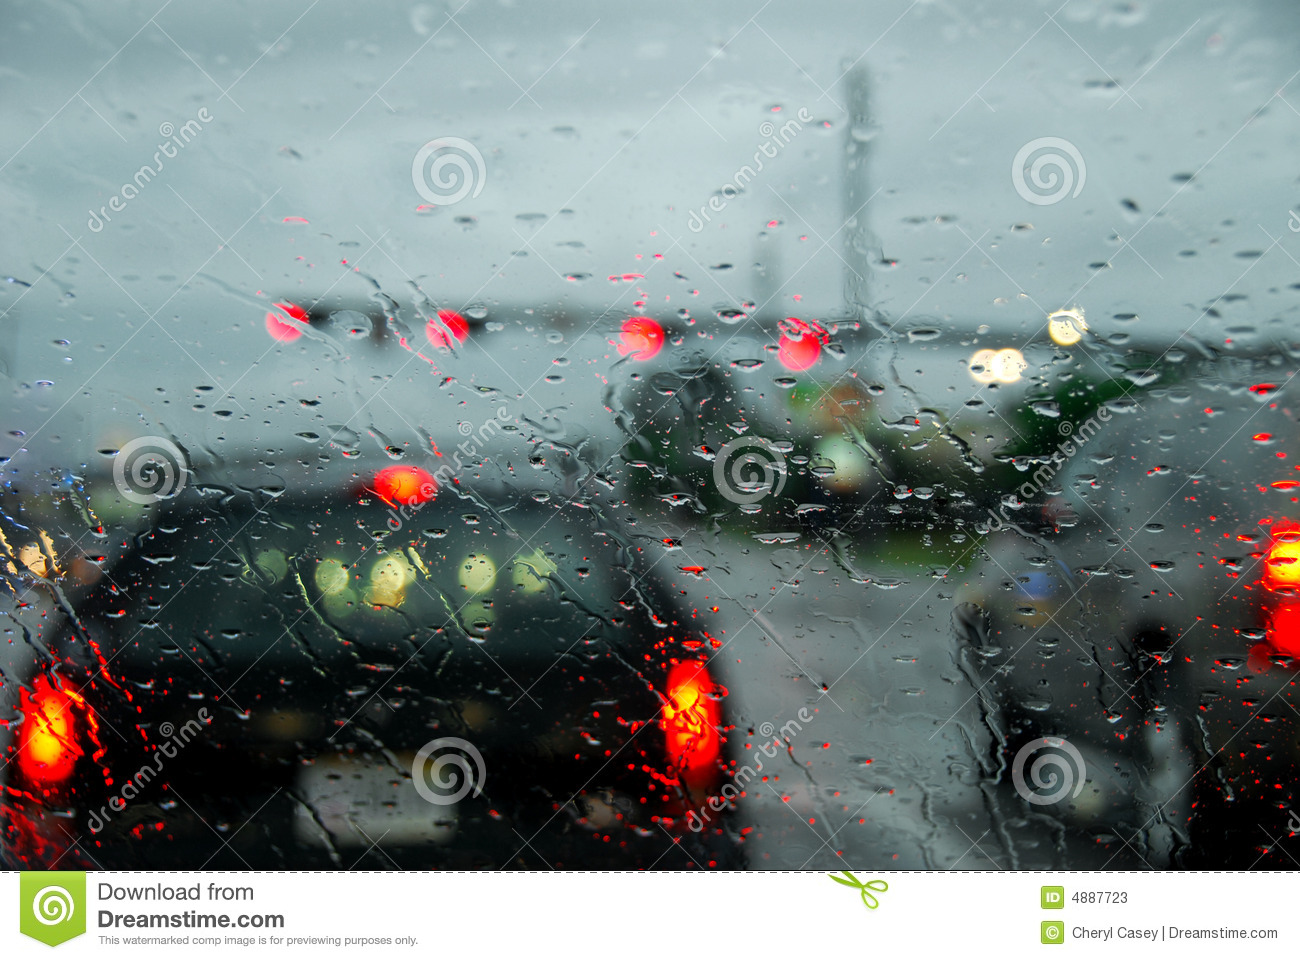 driving-rain-storm-4887723.jpg